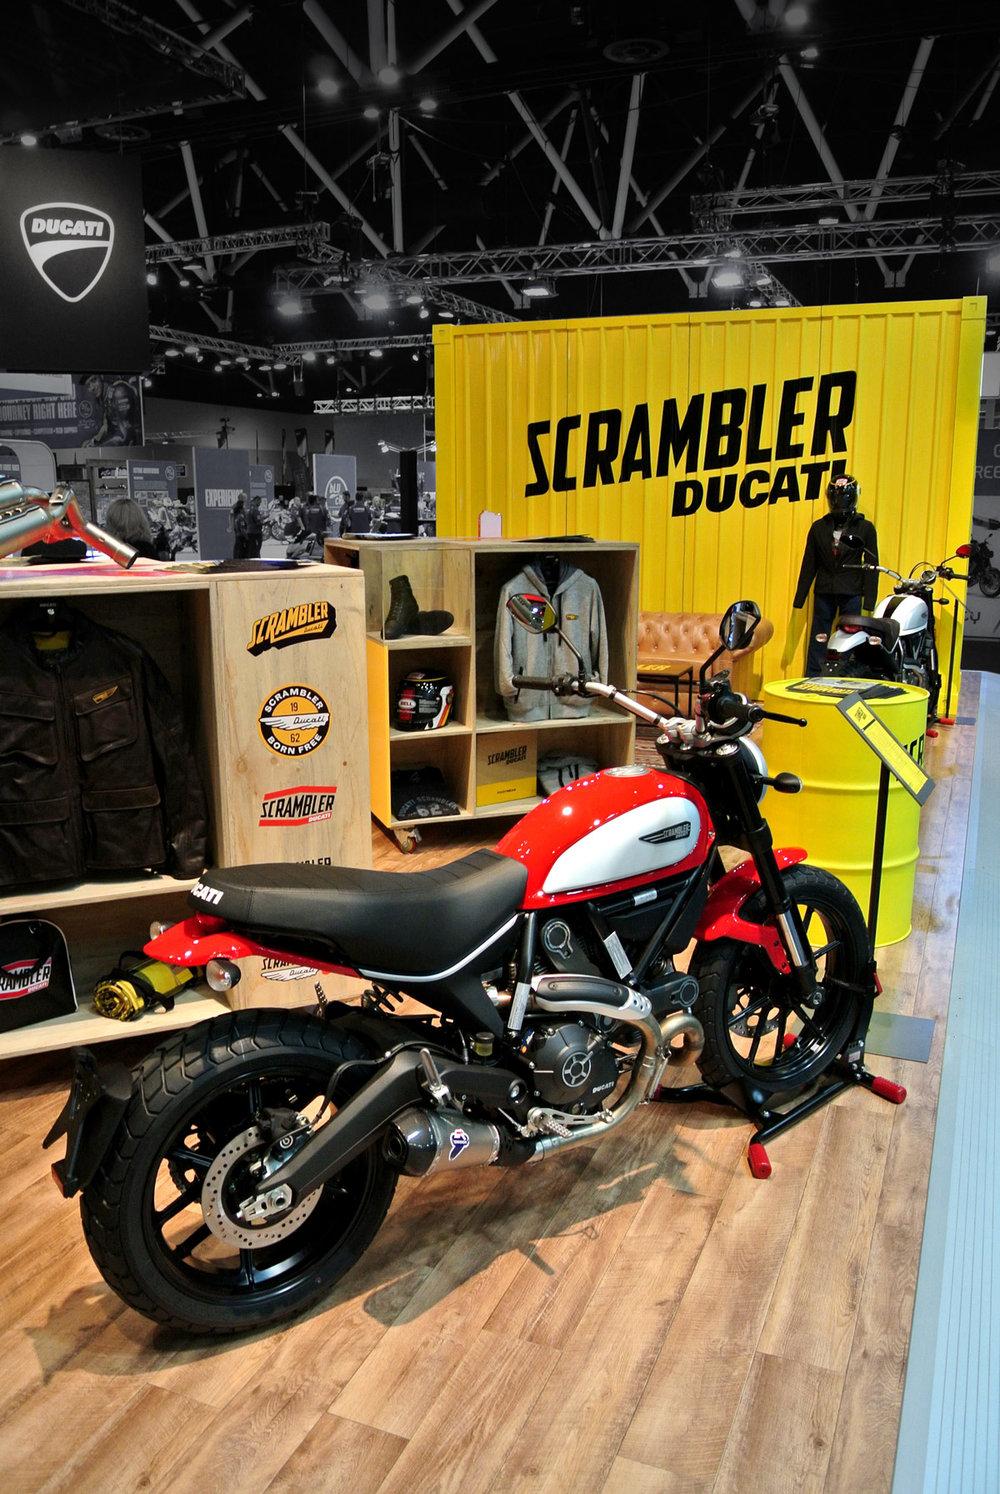 Scrambler_DSC_4306.jpg